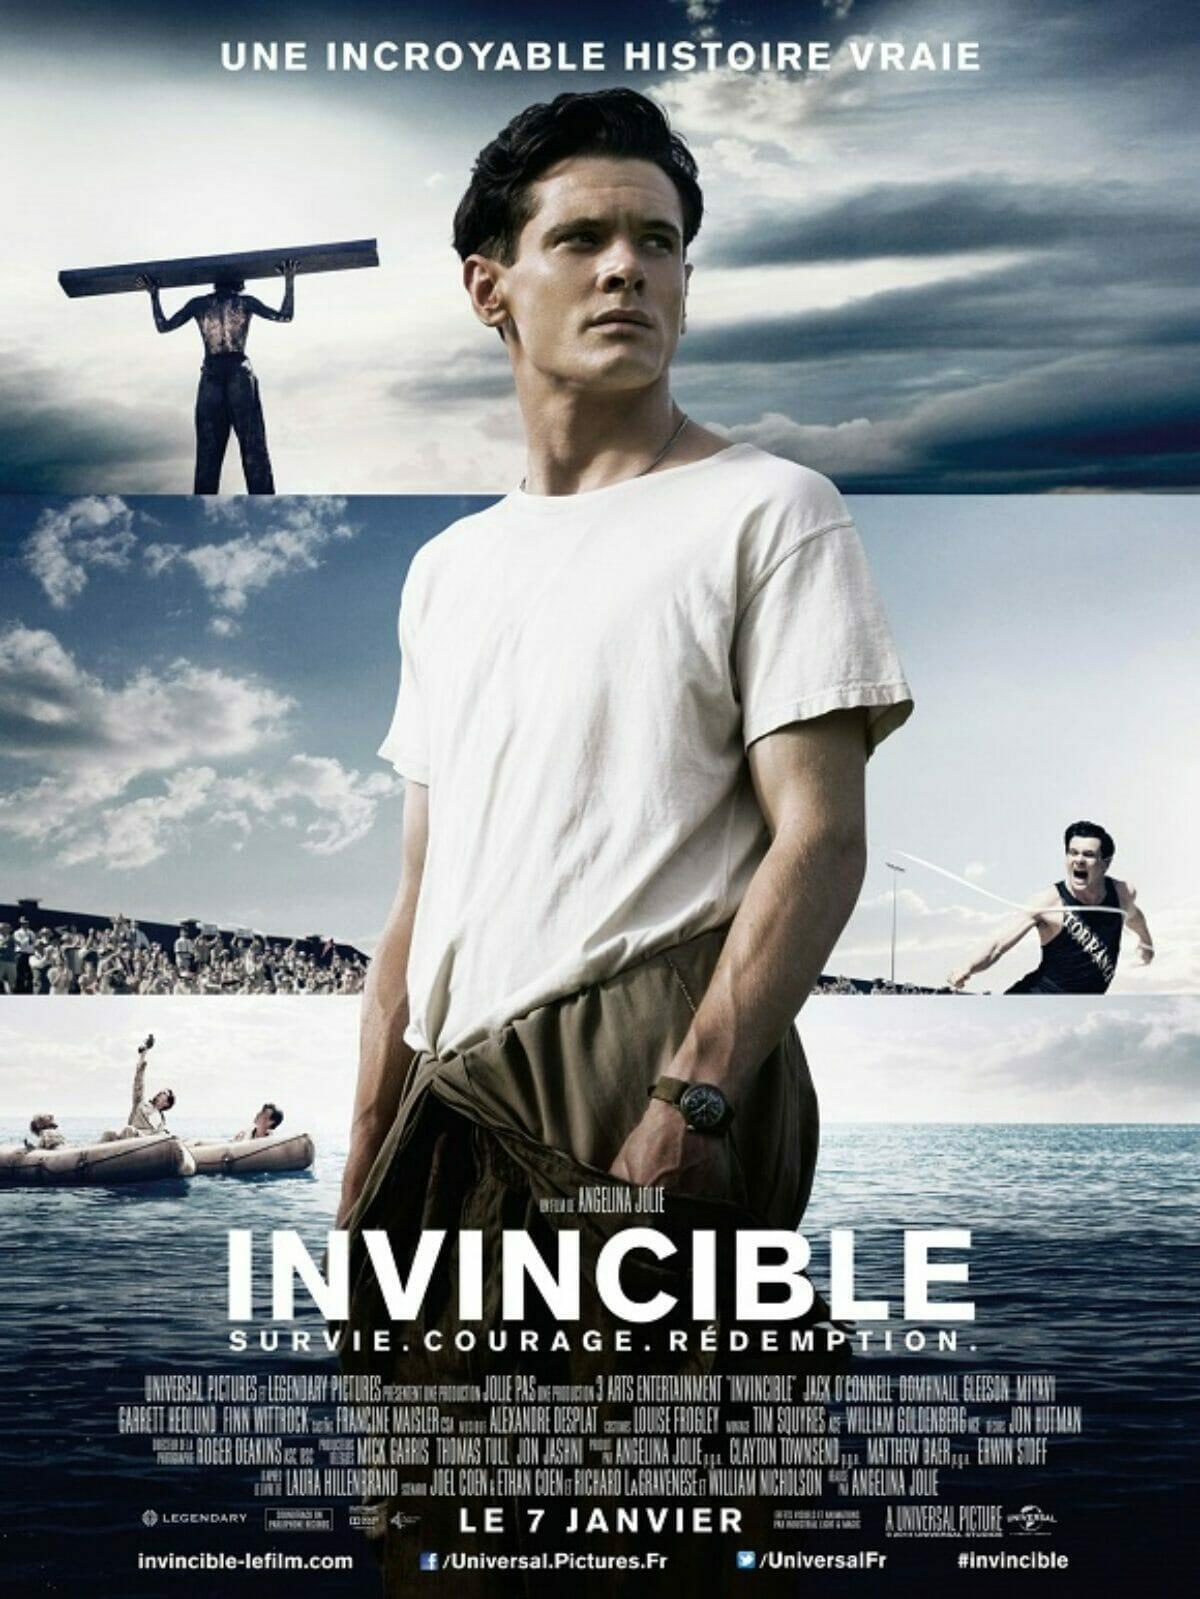 Invincible-affiche-poster-France